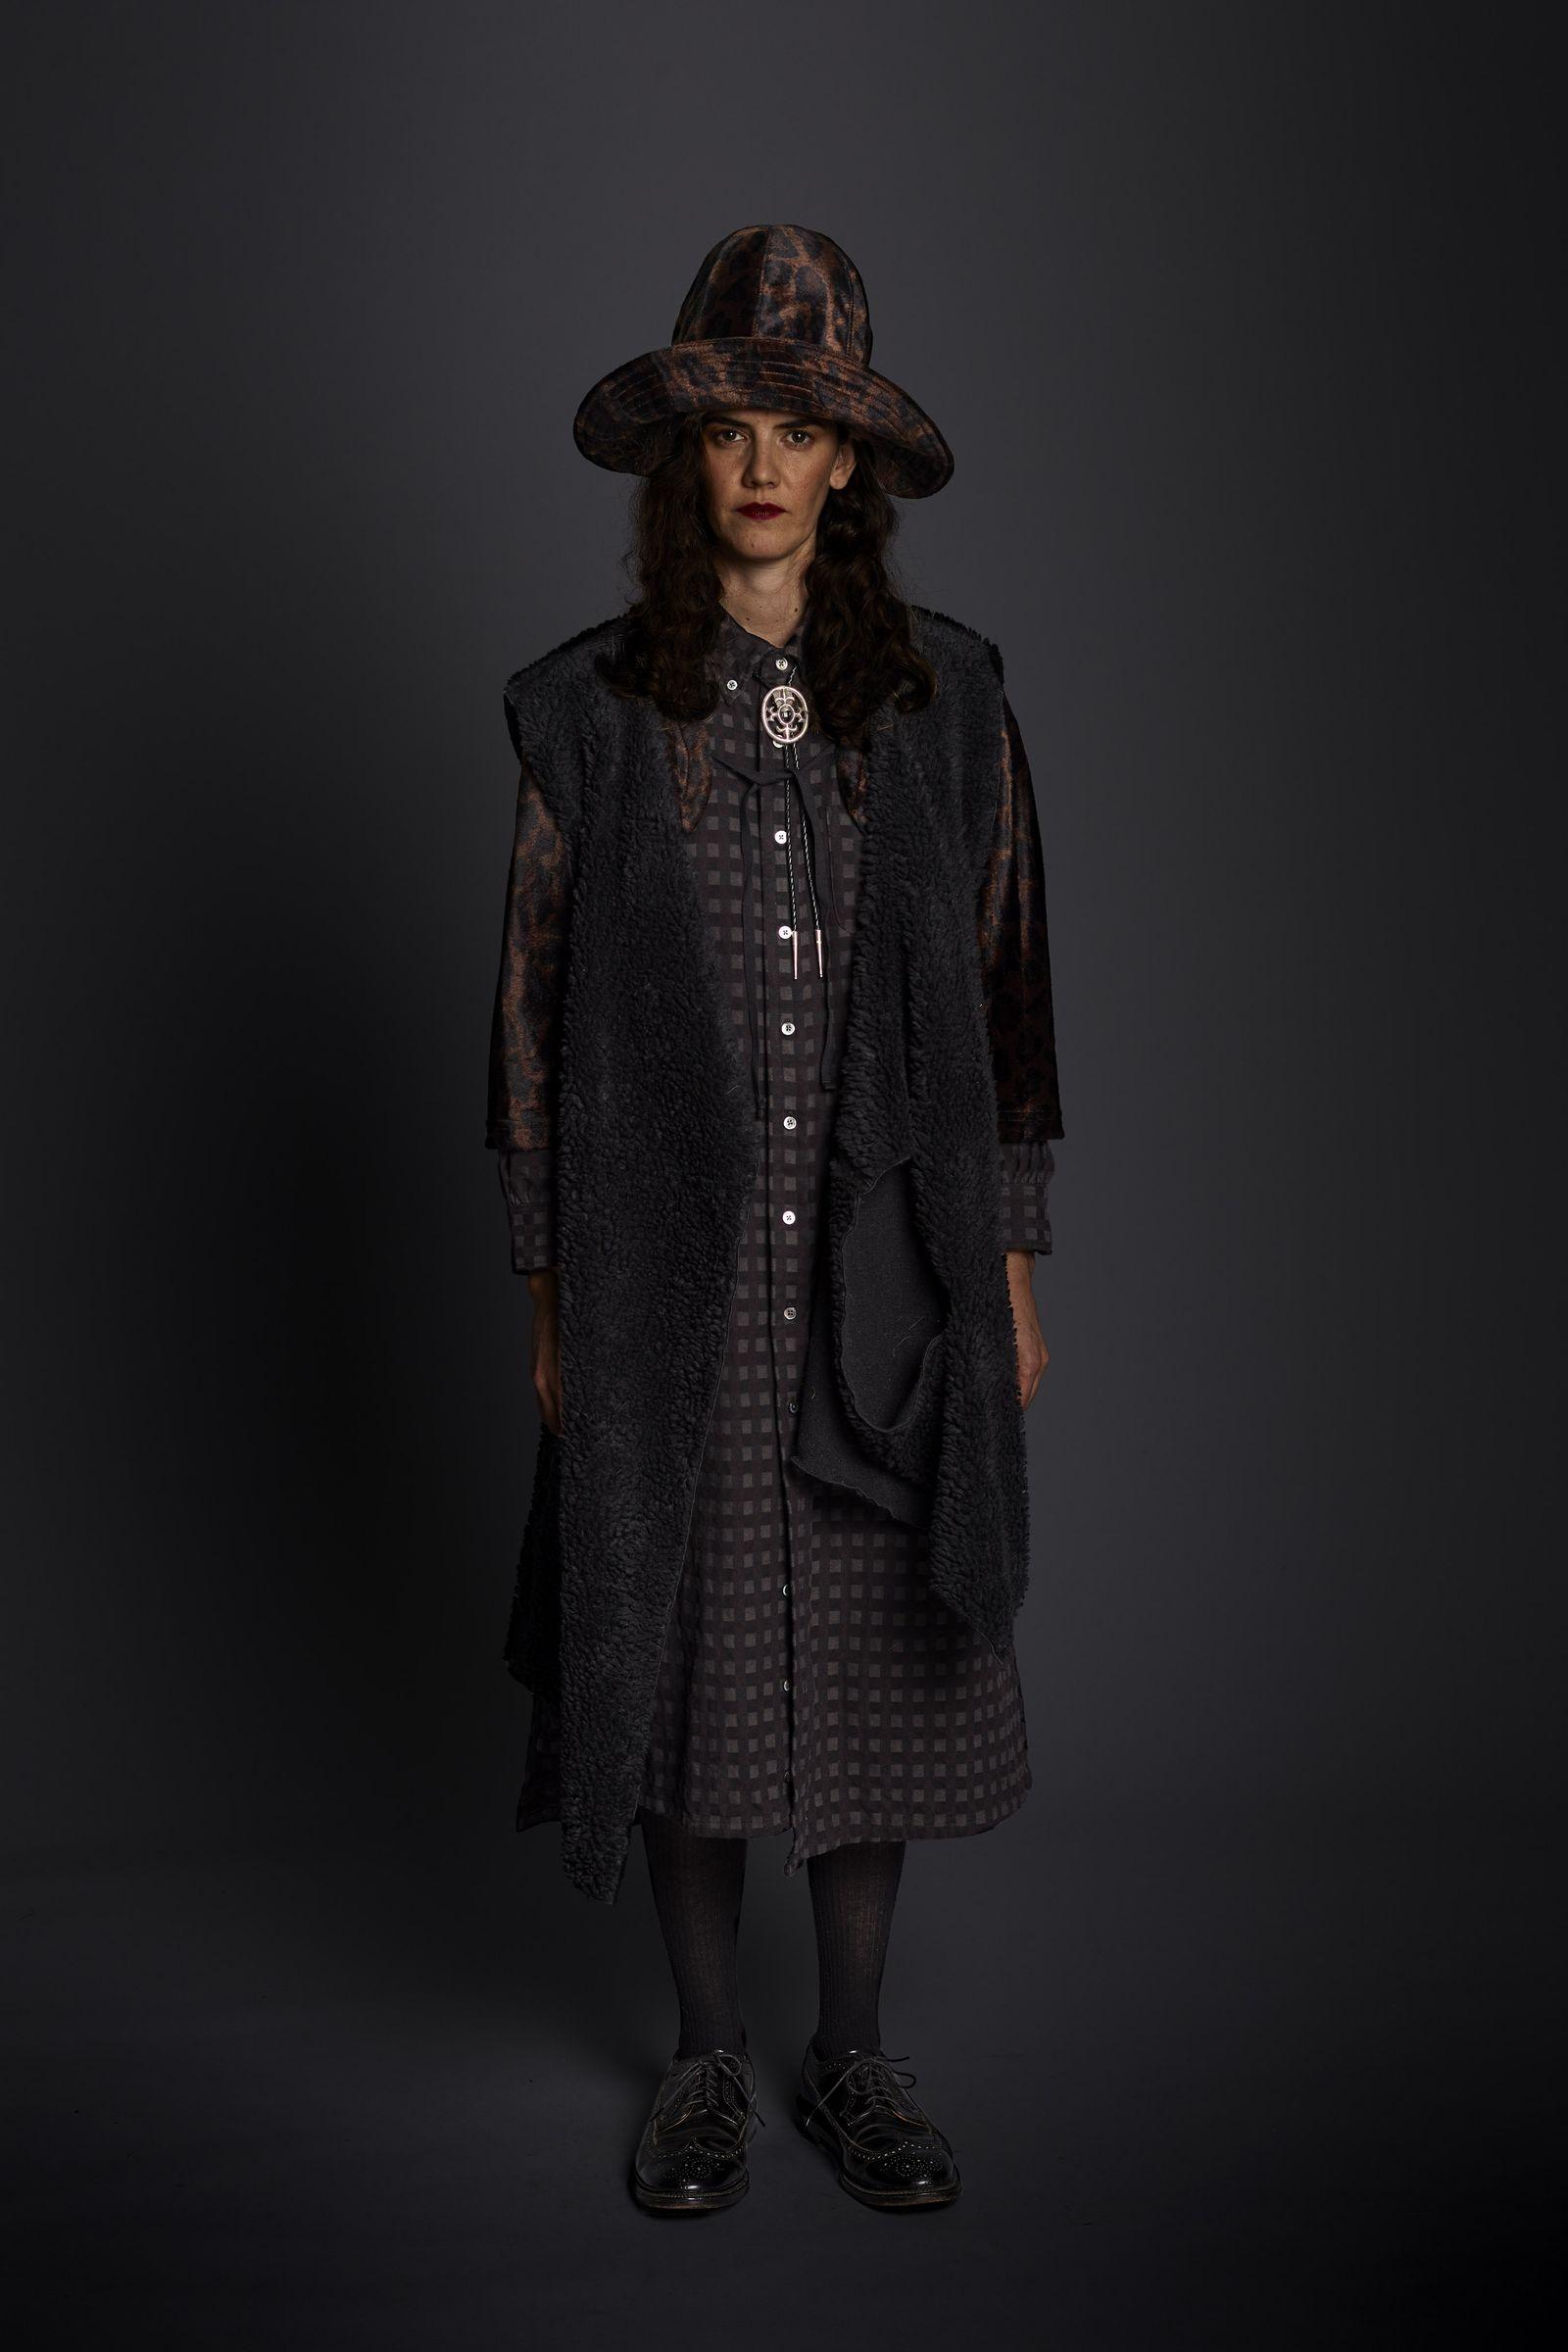 engineered-garments-fall-winter-2020-08